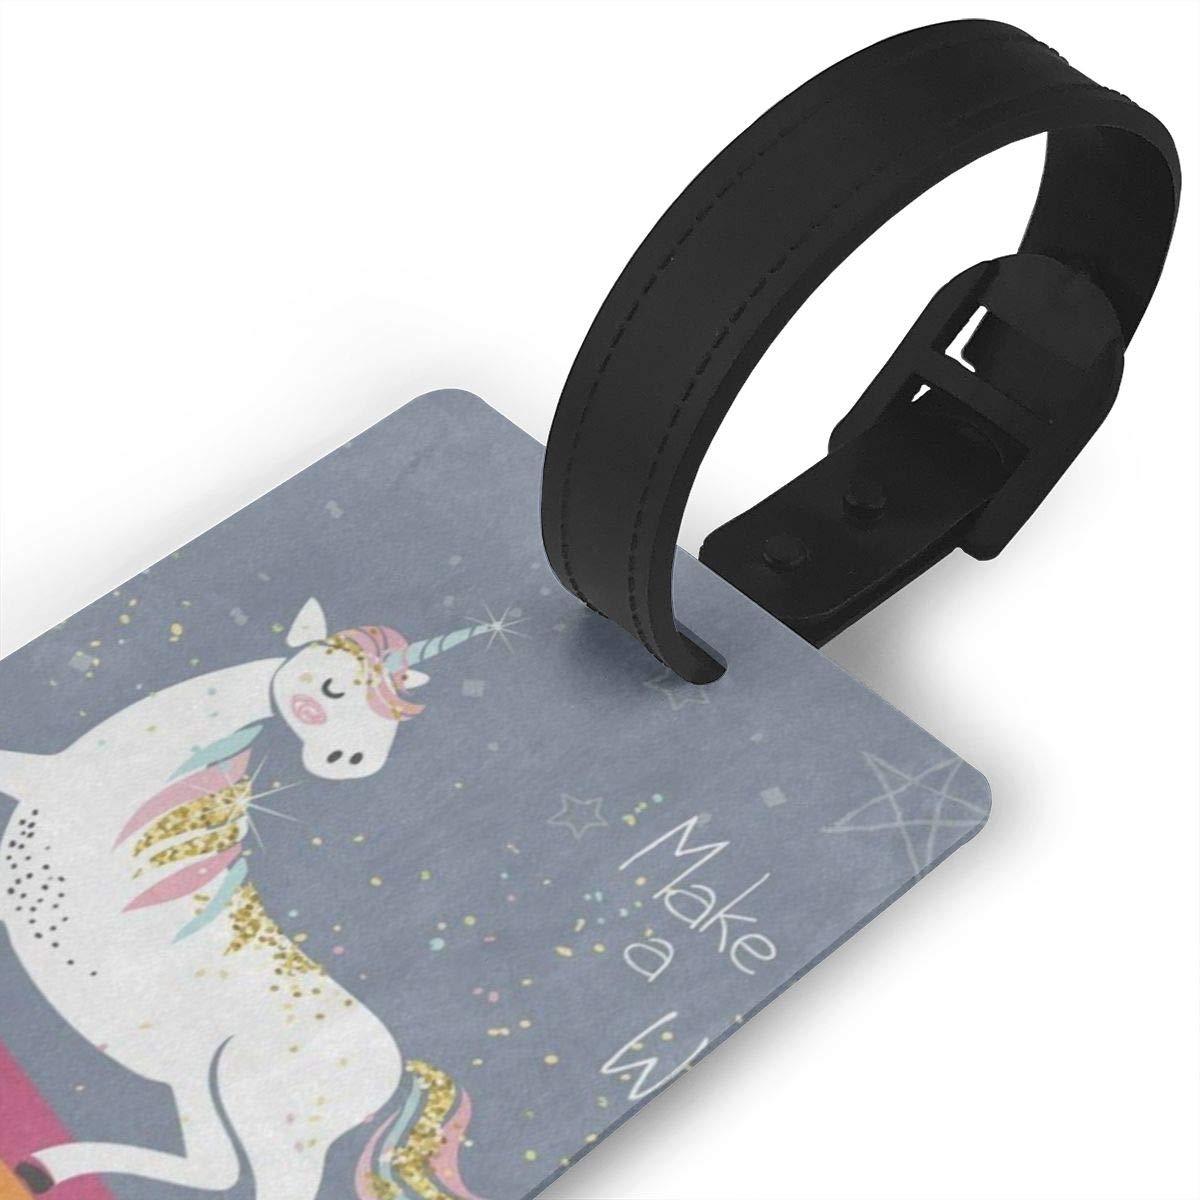 Luggage Tags Vintage Rainbow Unicorn Bag Tag for Travel 2 PCS